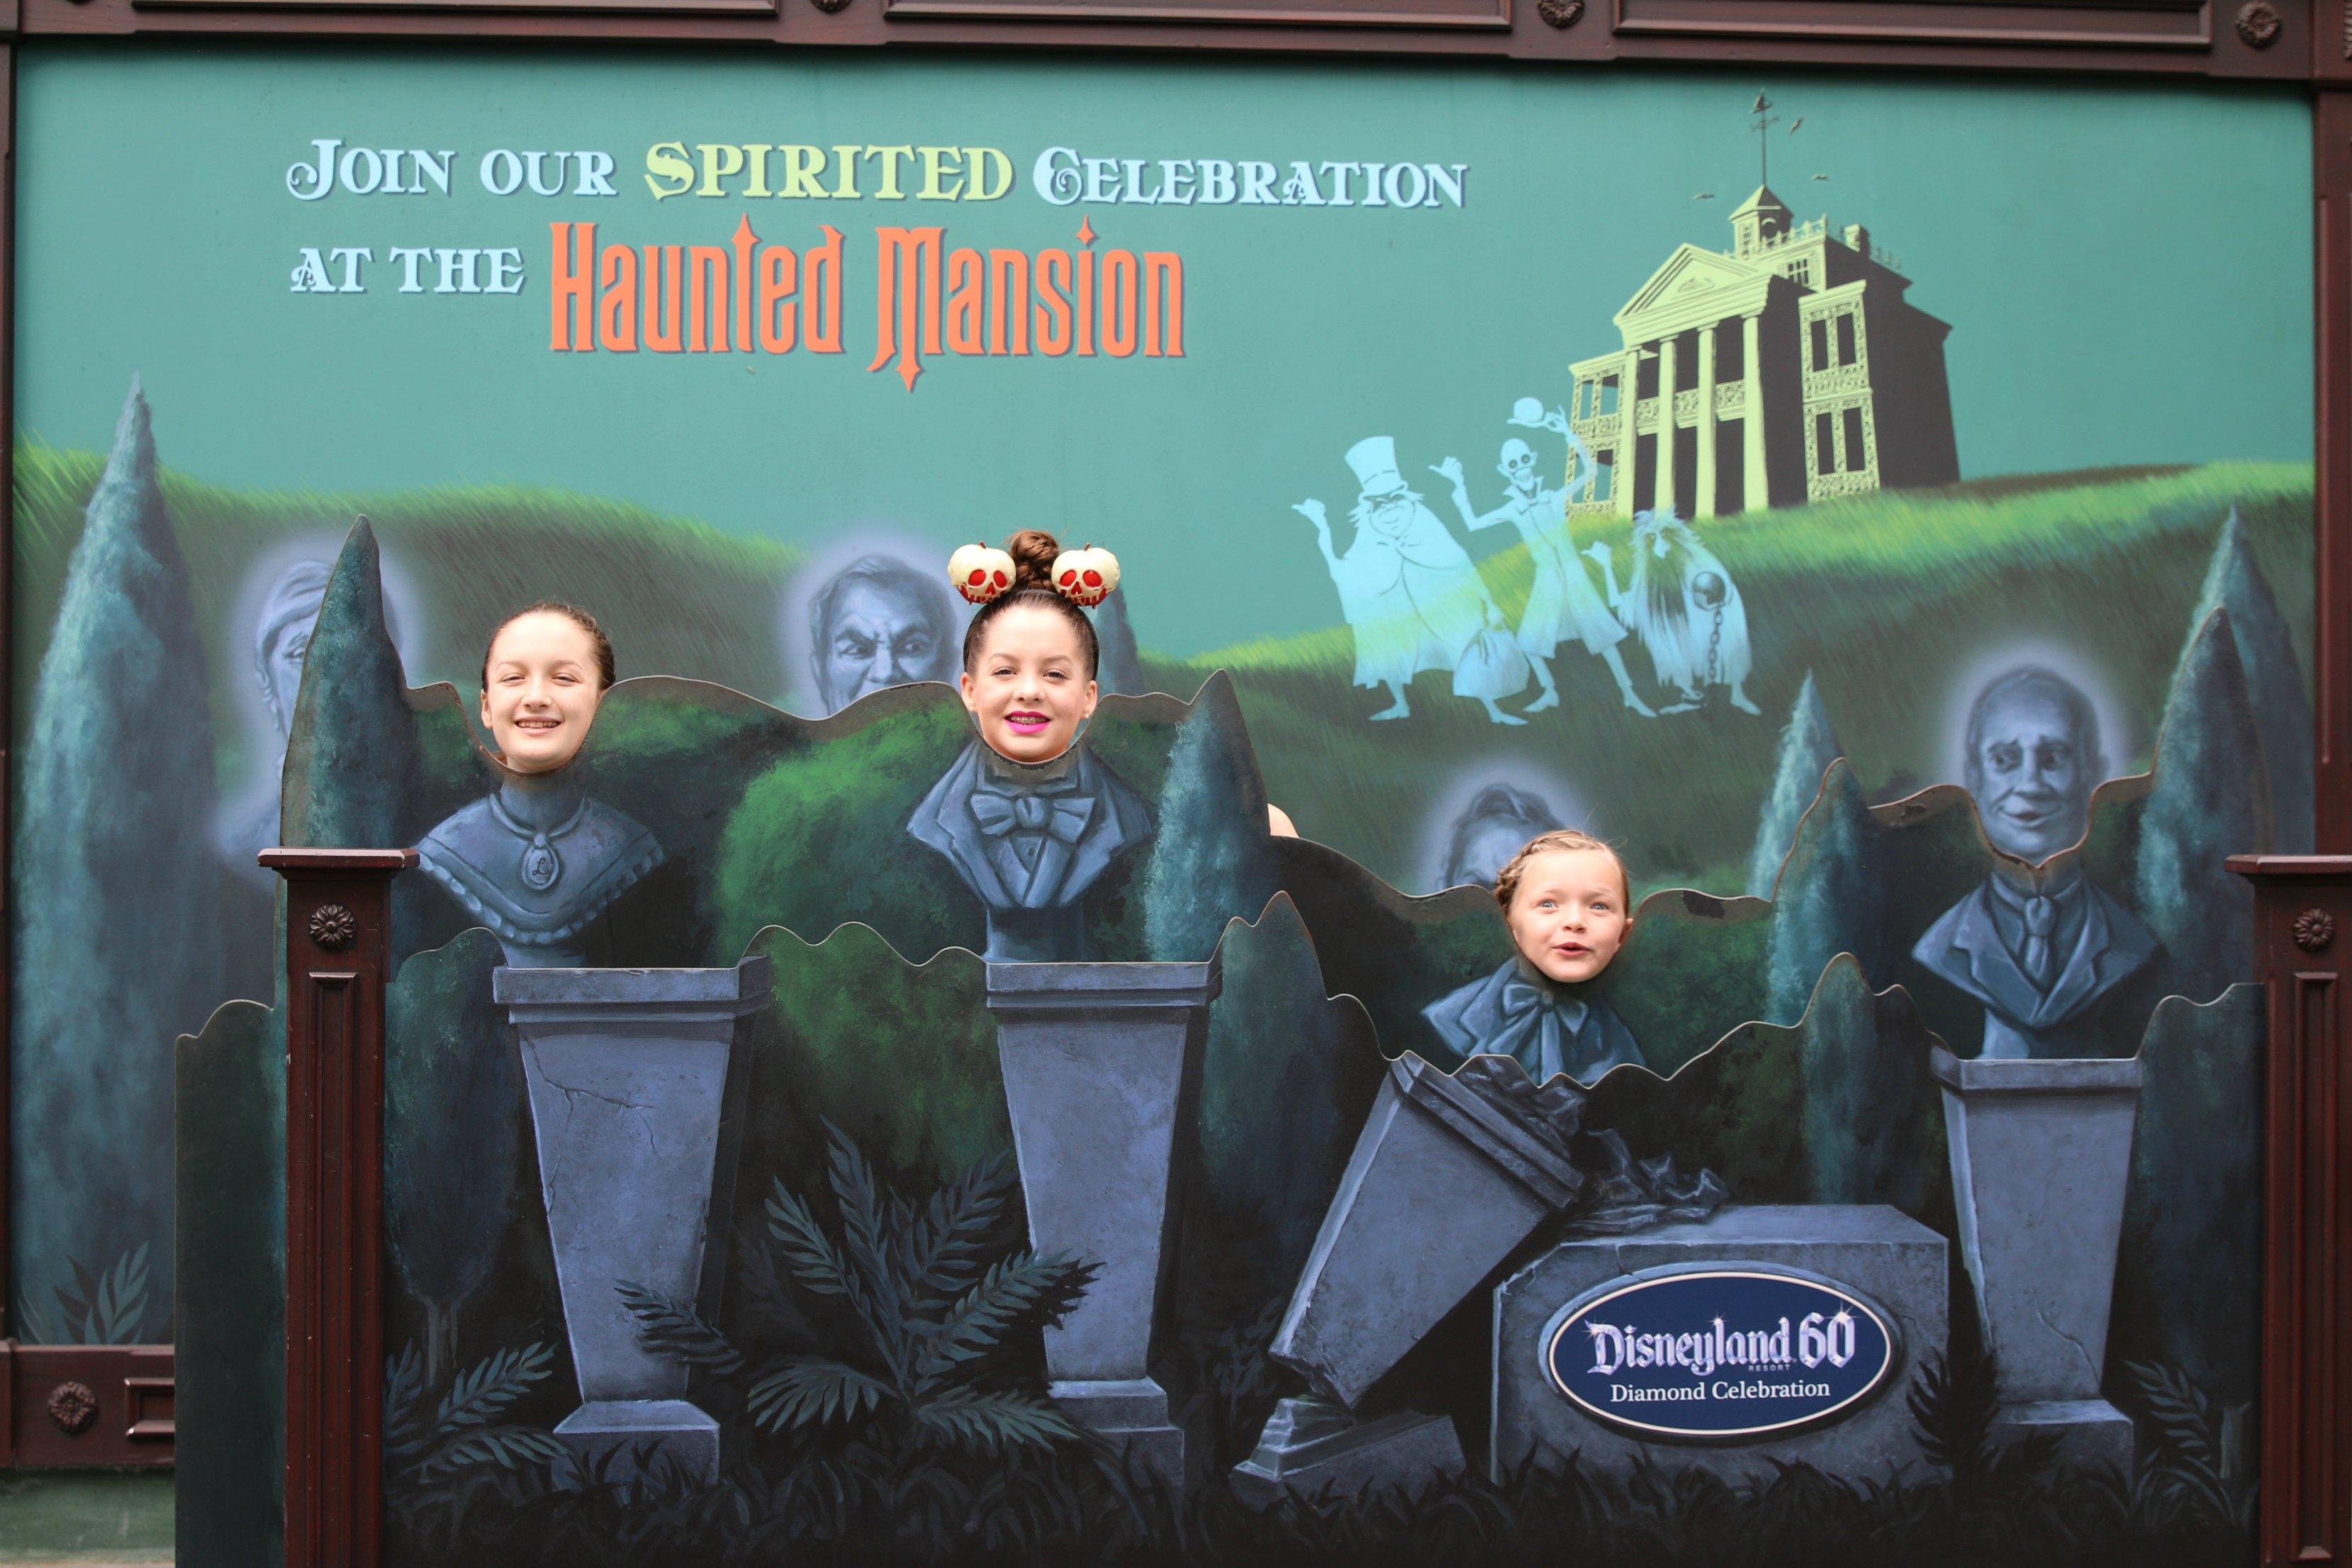 Disneyland 60 Haunted Mansion